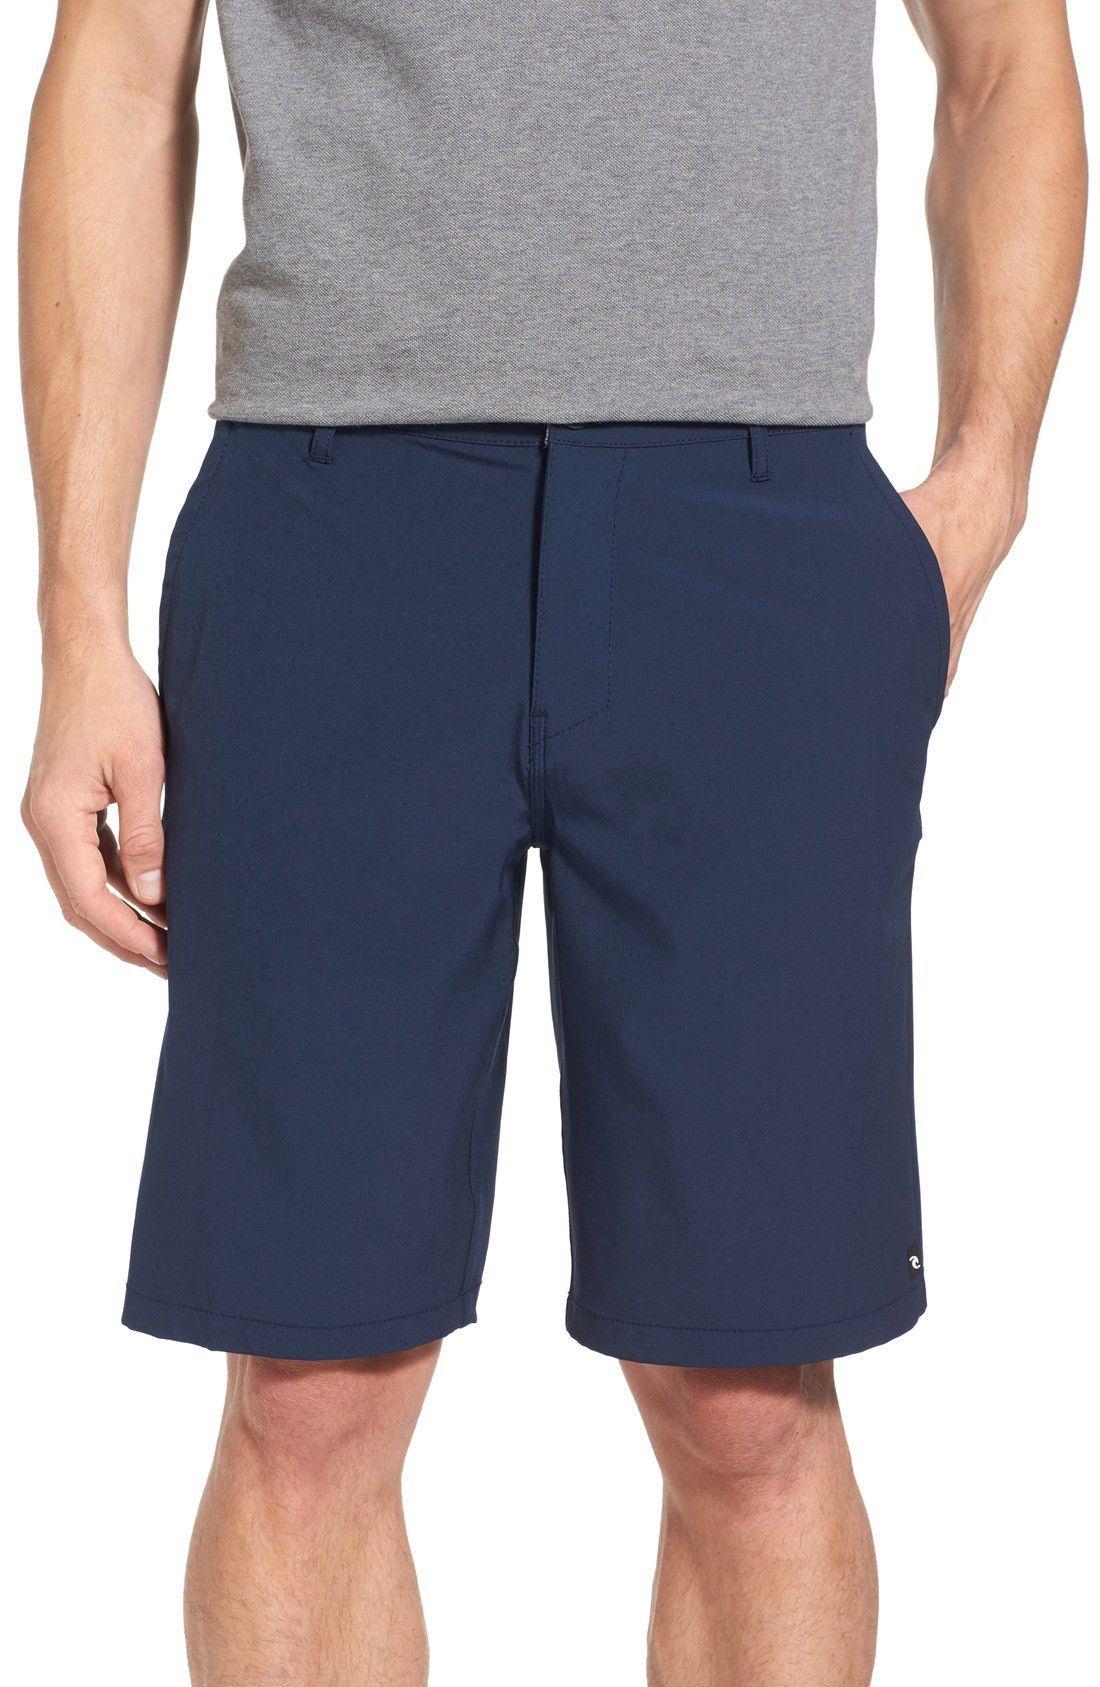 'Mirage' Boardwalk Shorts